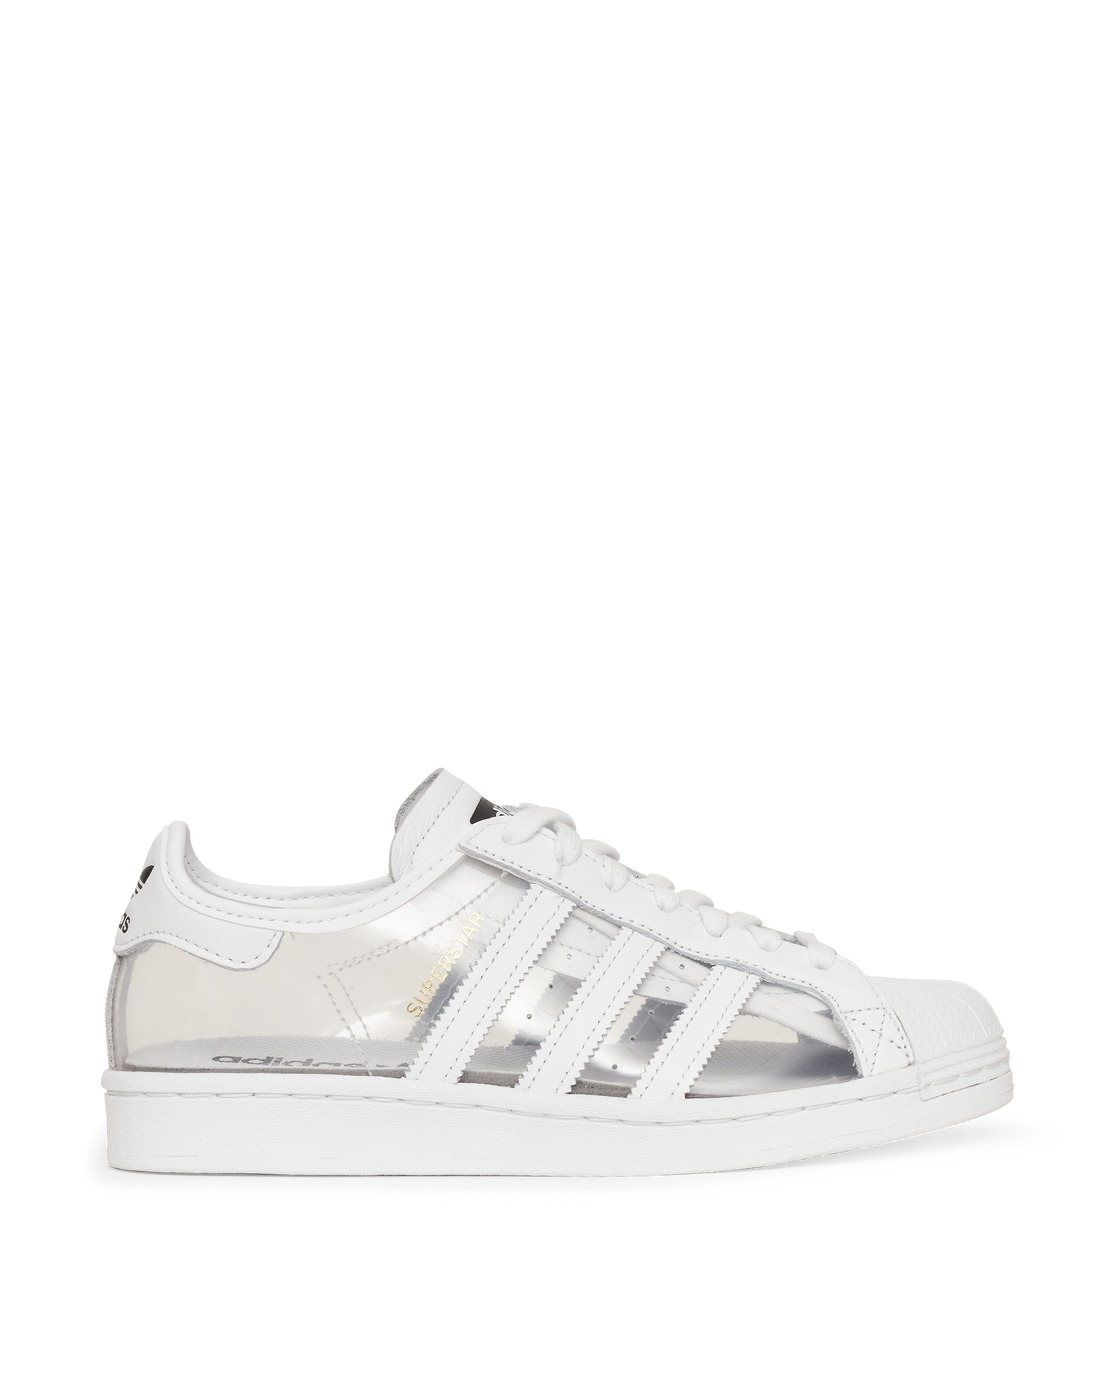 Adidas Originals Superstar Sneakers Core Black 36